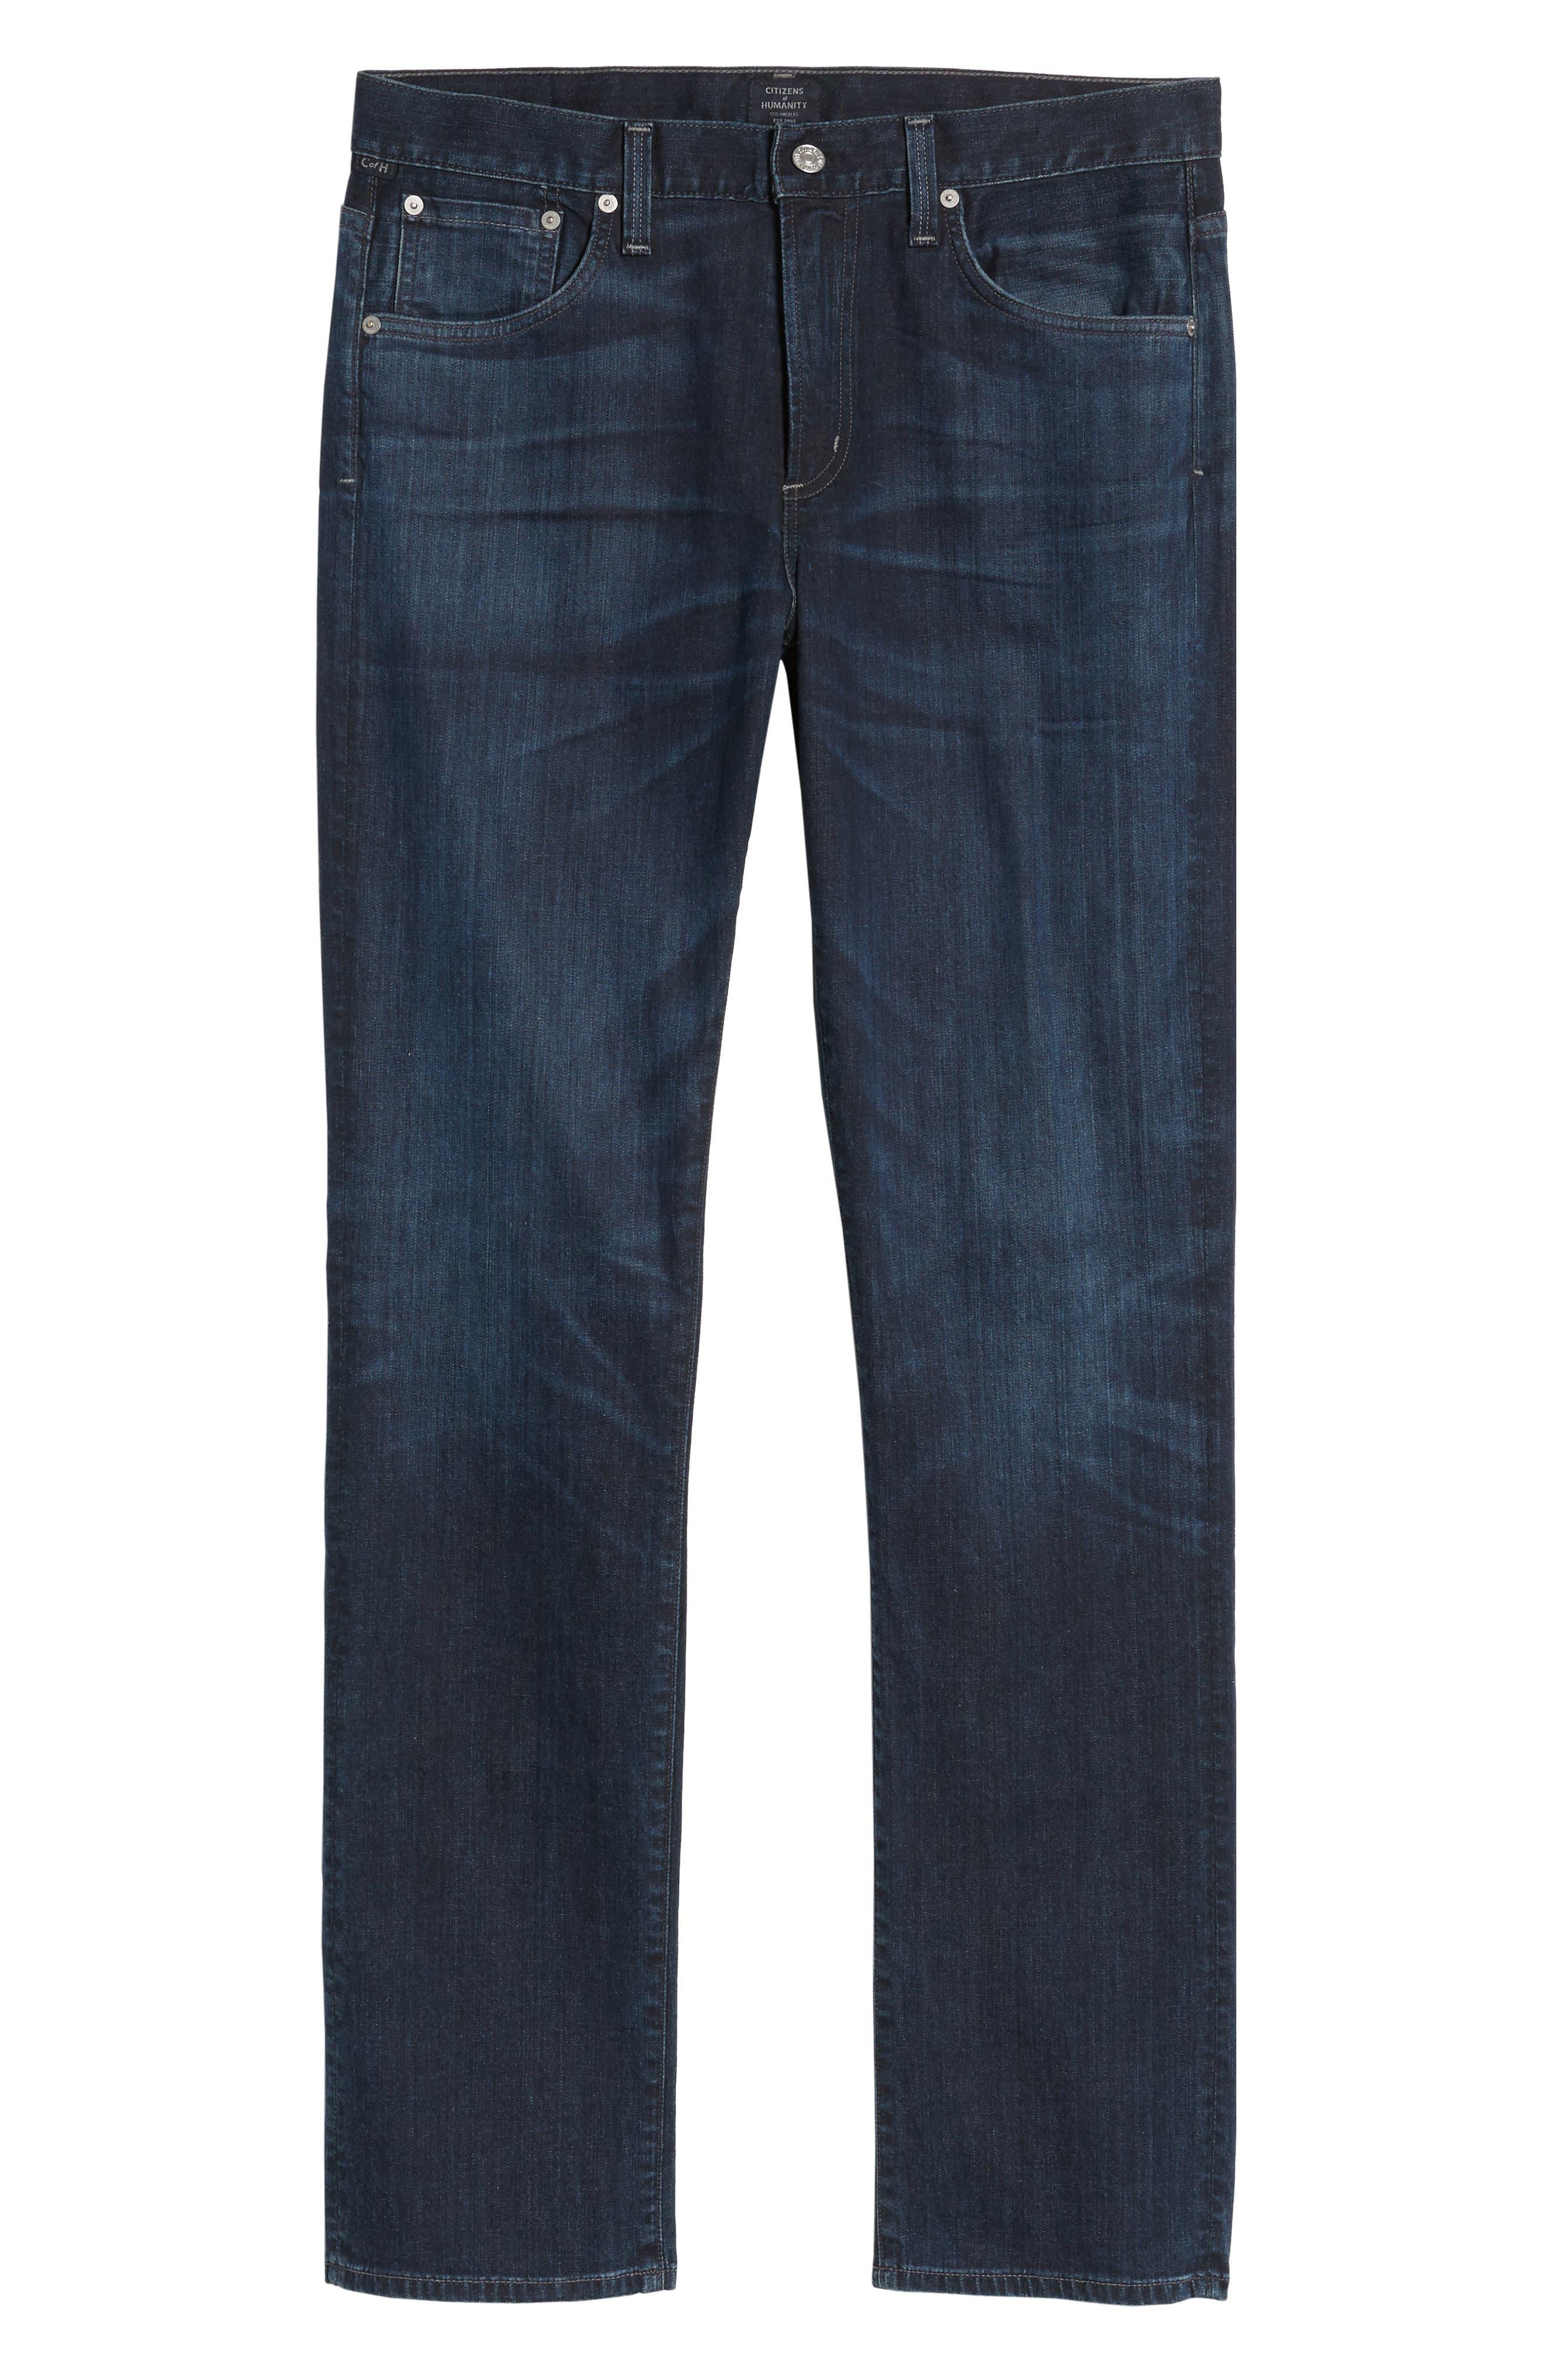 Gage Slim Straight Leg Jeans,                             Alternate thumbnail 6, color,                             Newman